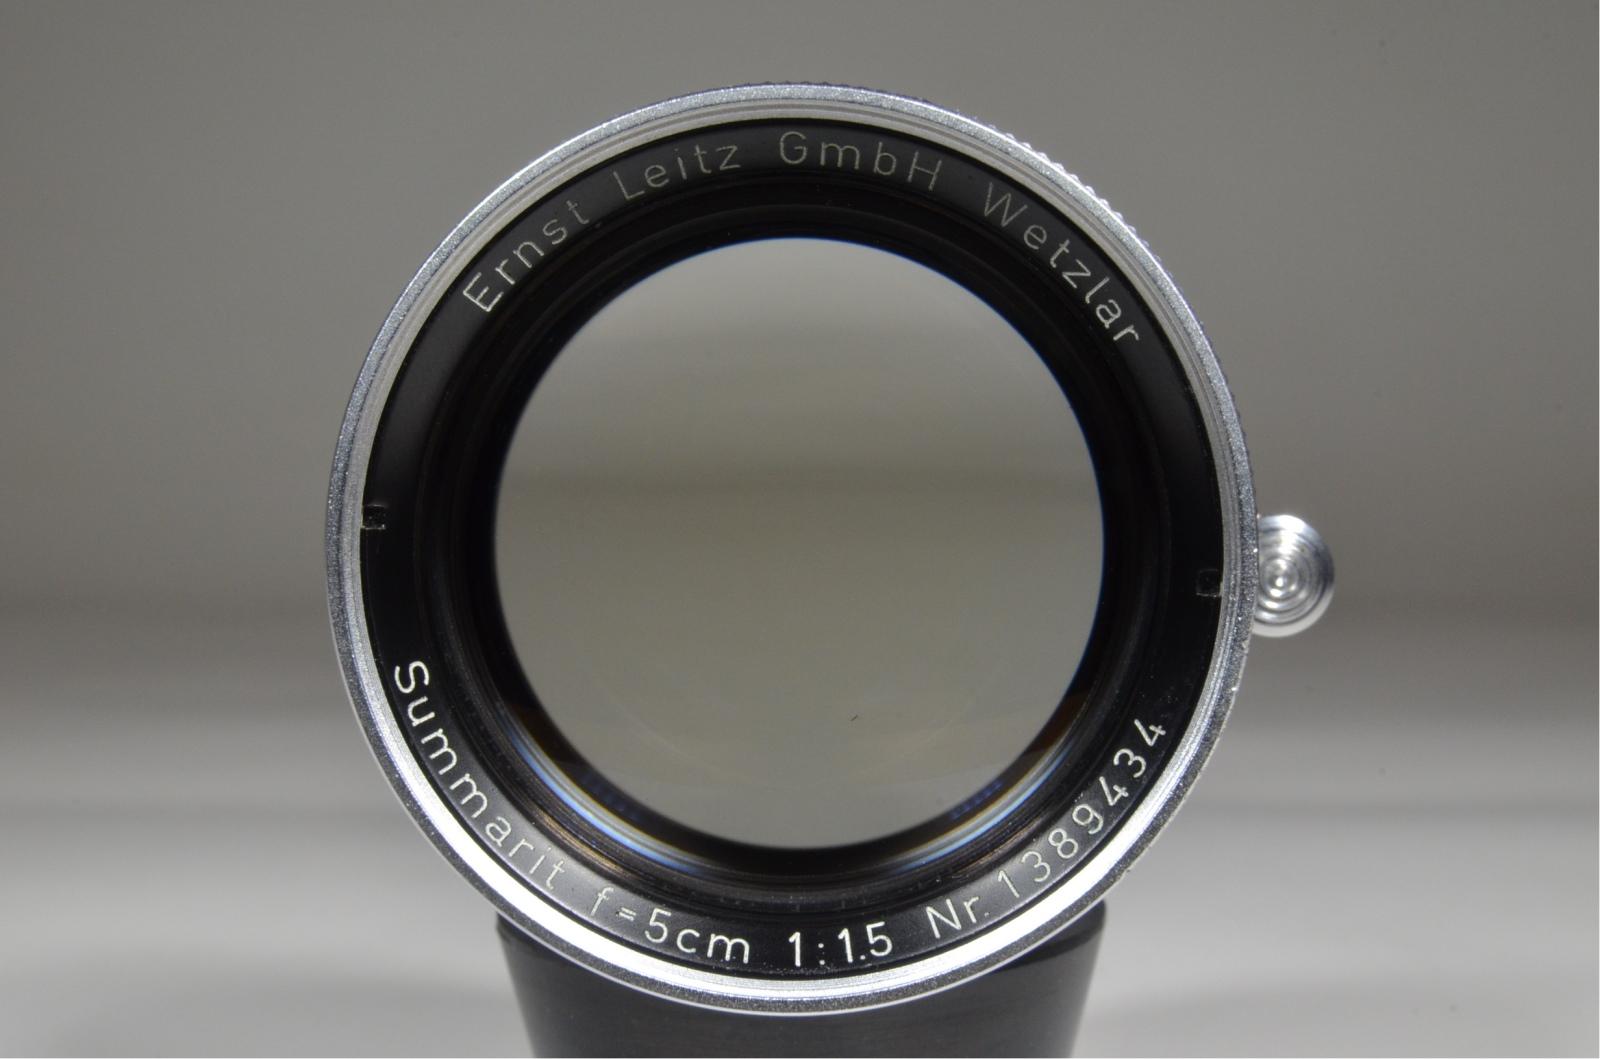 leica m2 camera s/n 1104628 self timer with summarit 50mm f1.5 lens